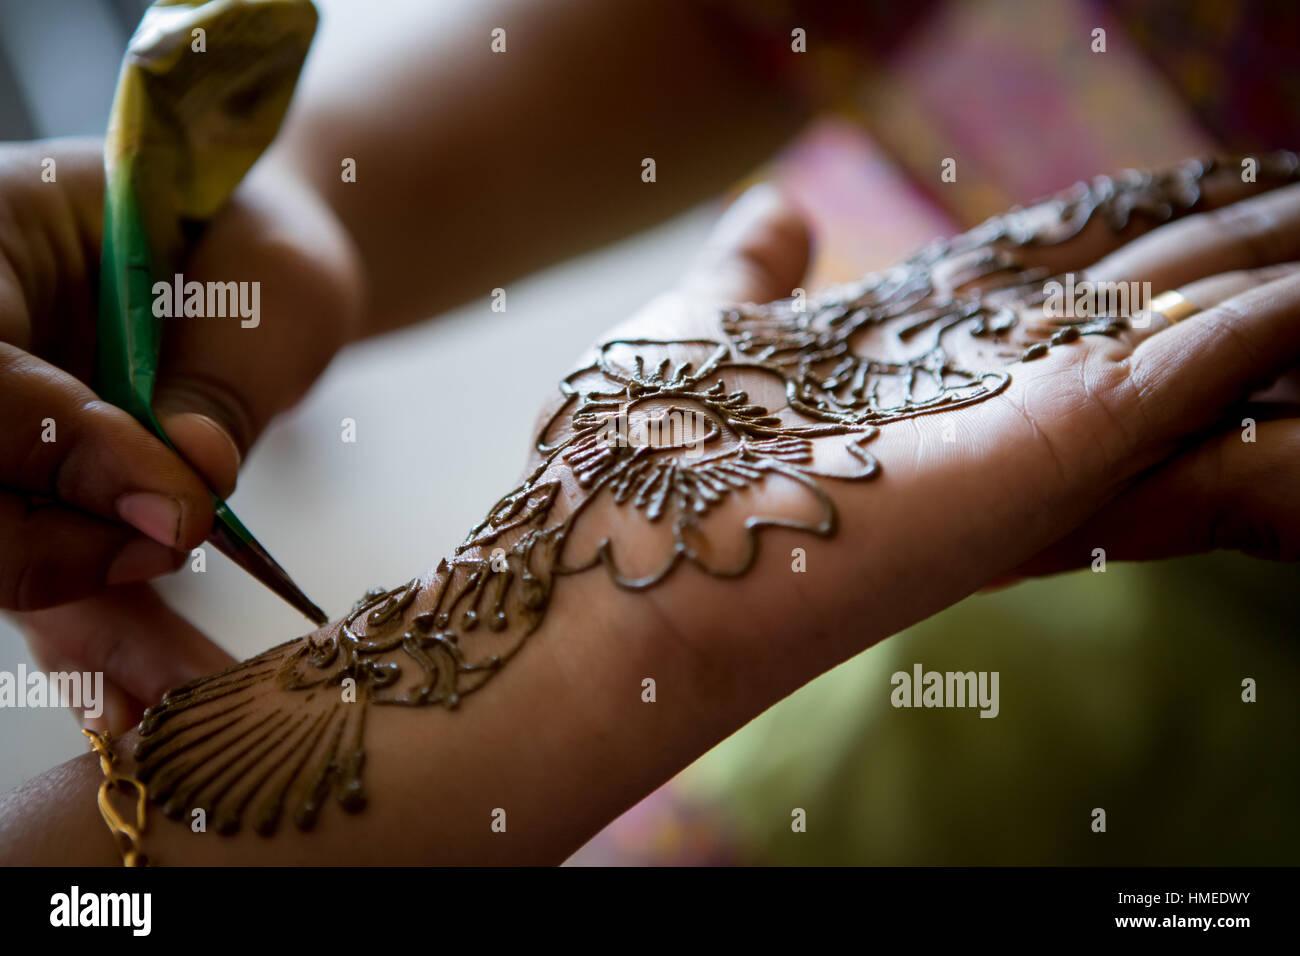 Close up of henna hand painting, Madurai, India - Stock Image